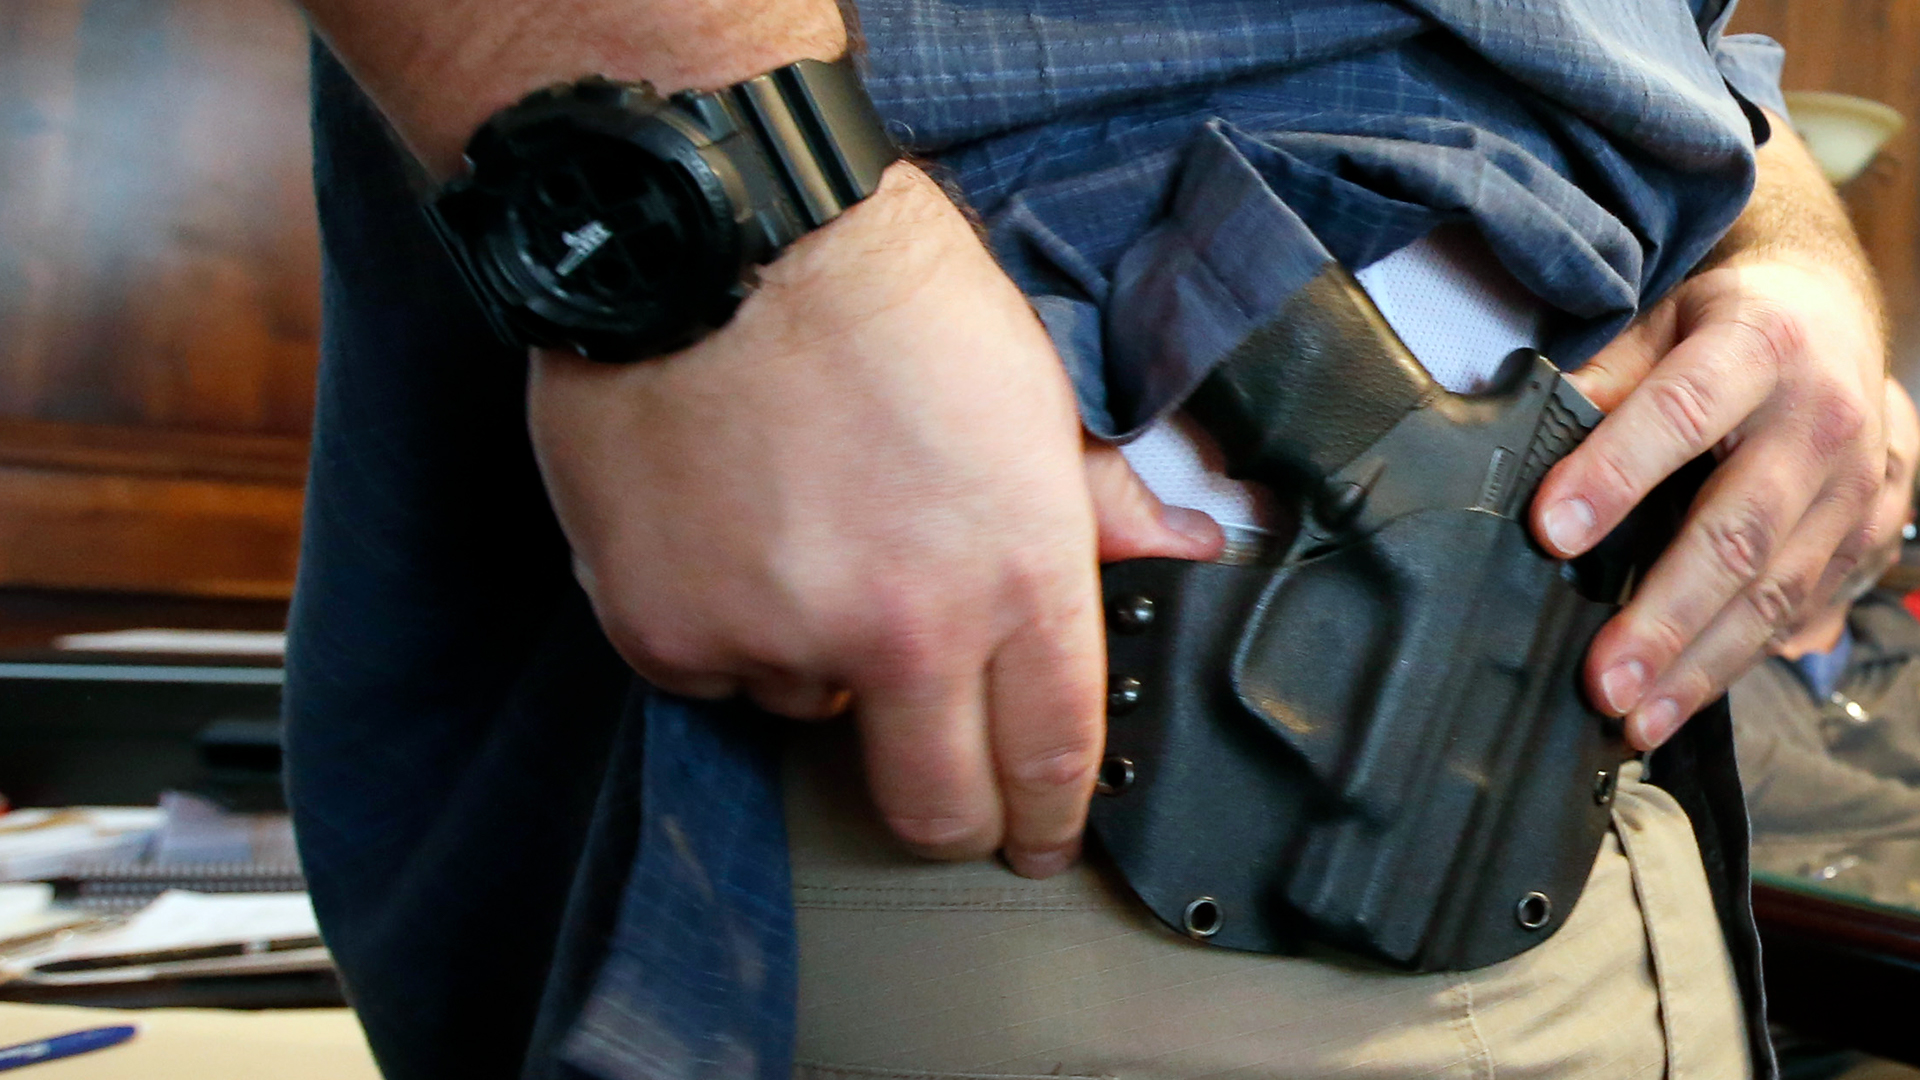 Concealed Carry Gun in Holster-159532.jpg49674361